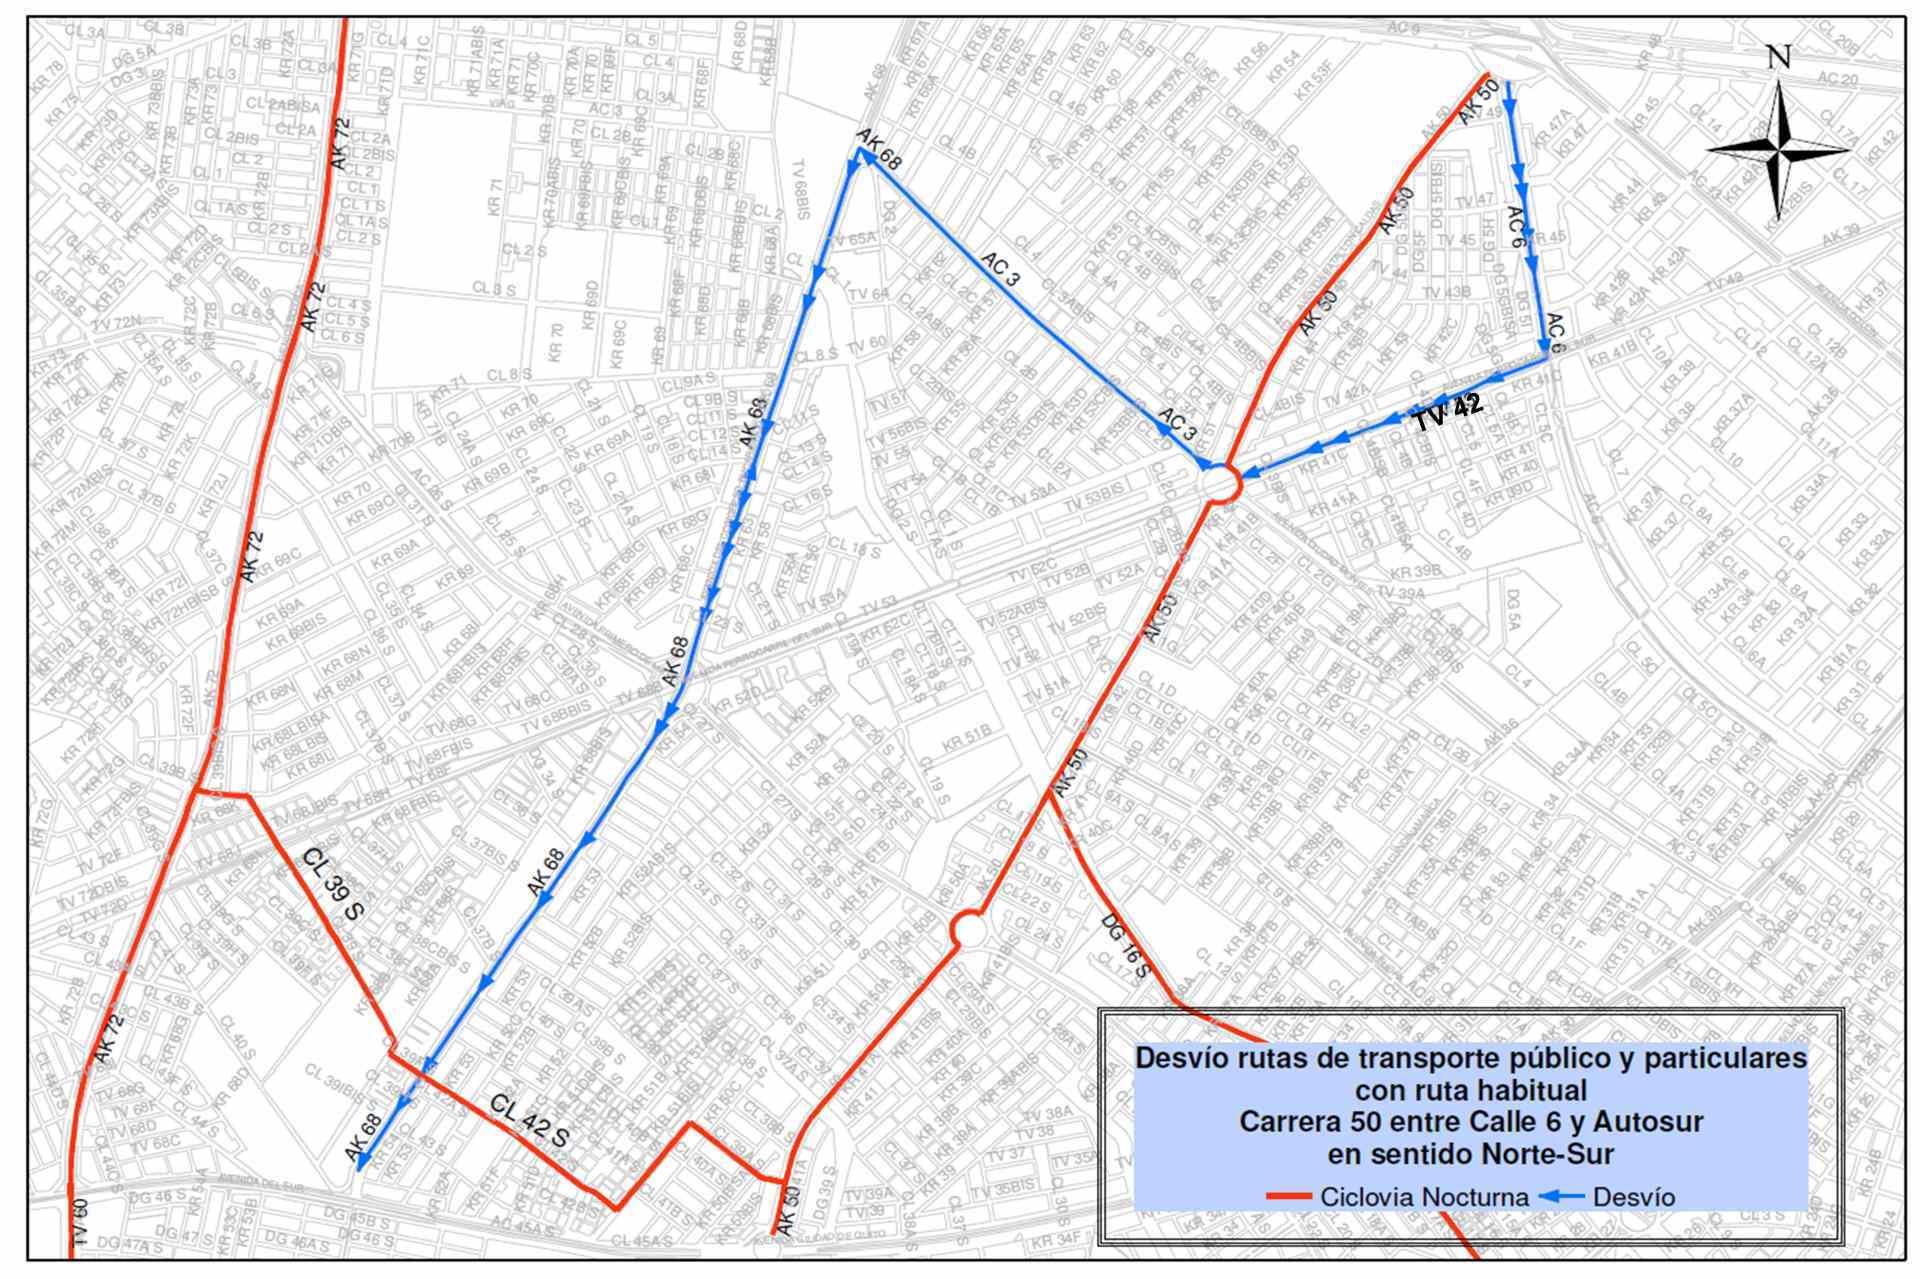 Mapa 12 - desvíos - ciclovía nocturna